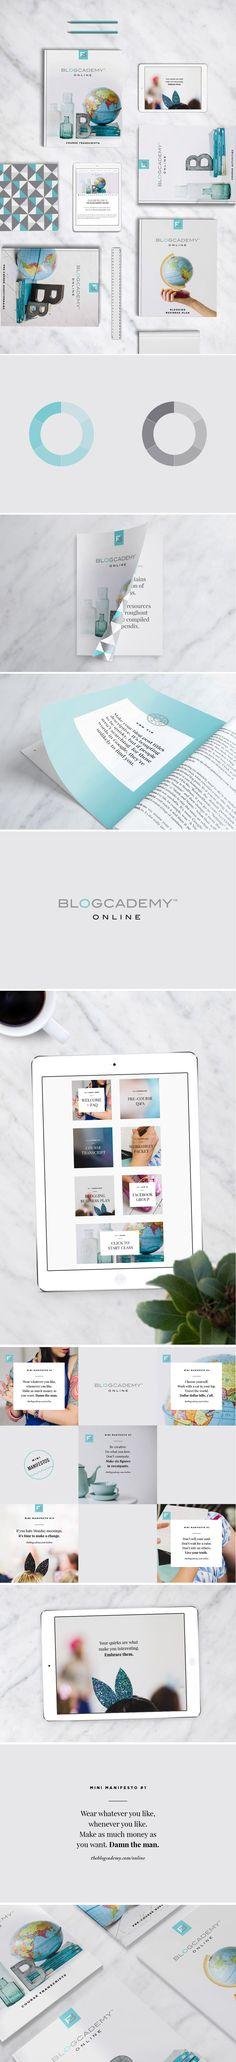 Branch | Blogcademy Online